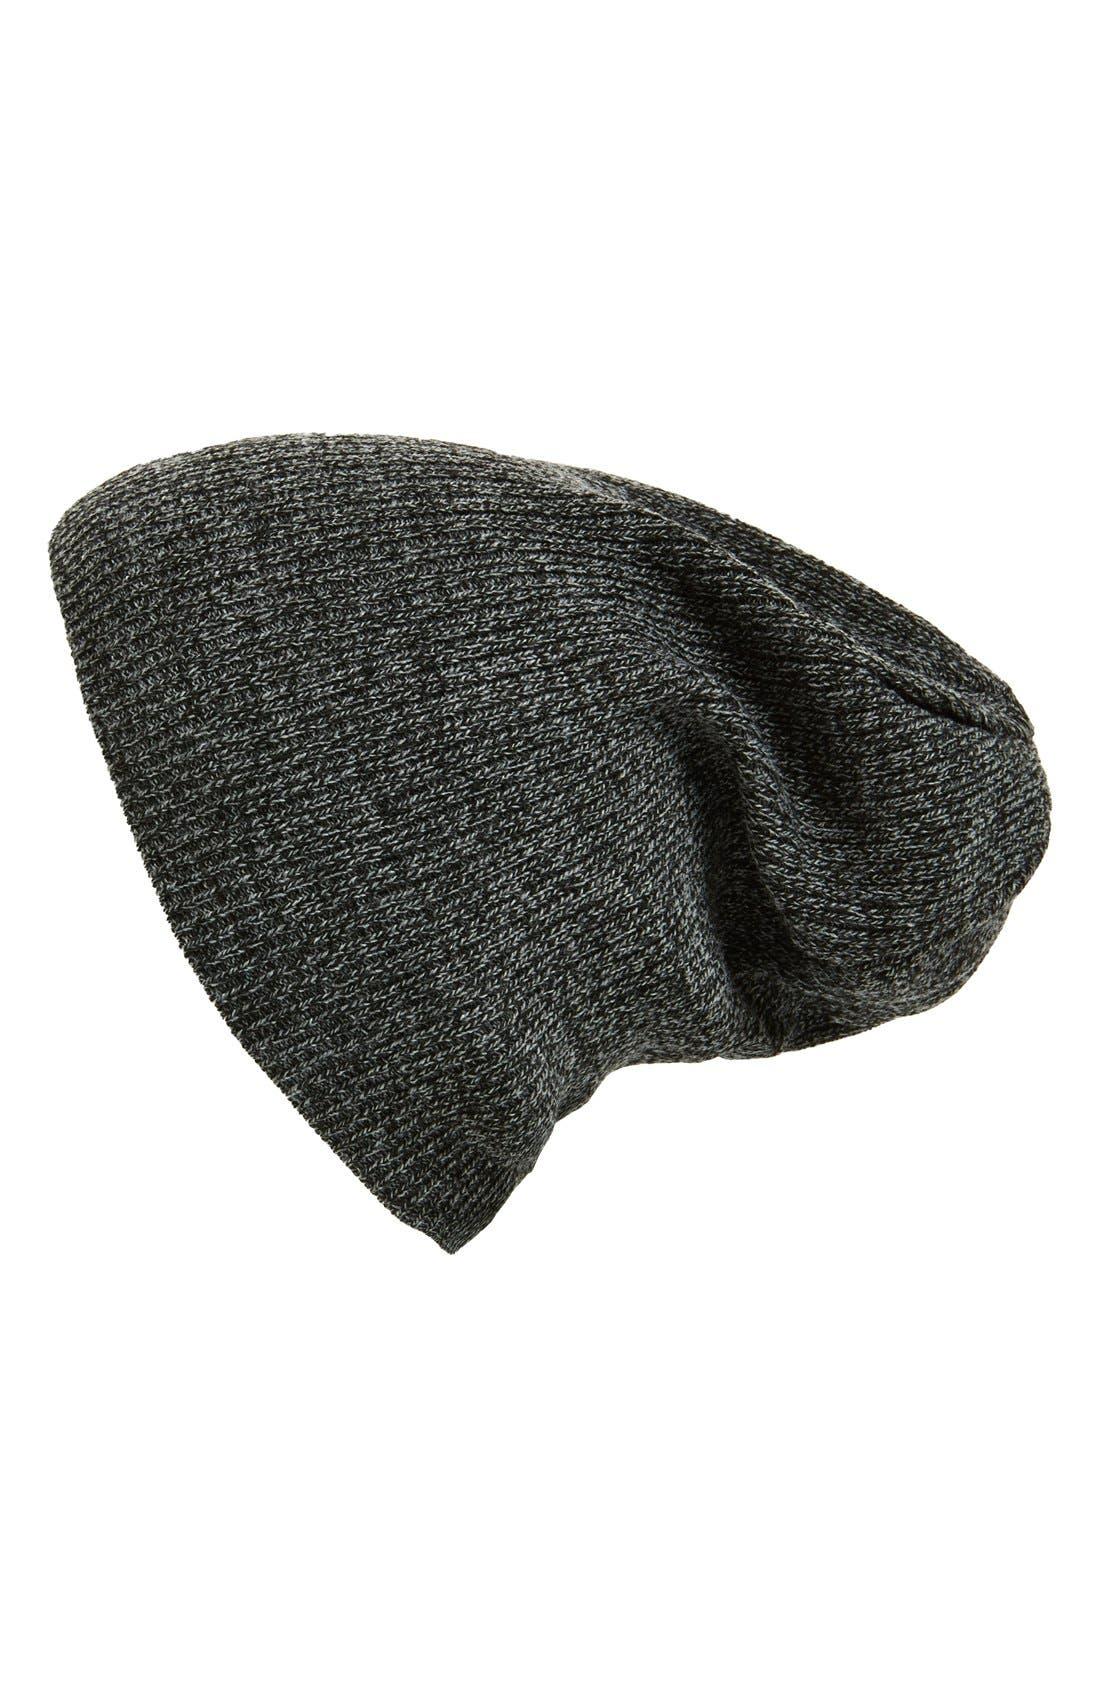 Alternate Image 1 Selected - Topman Slouchy Knit Cap